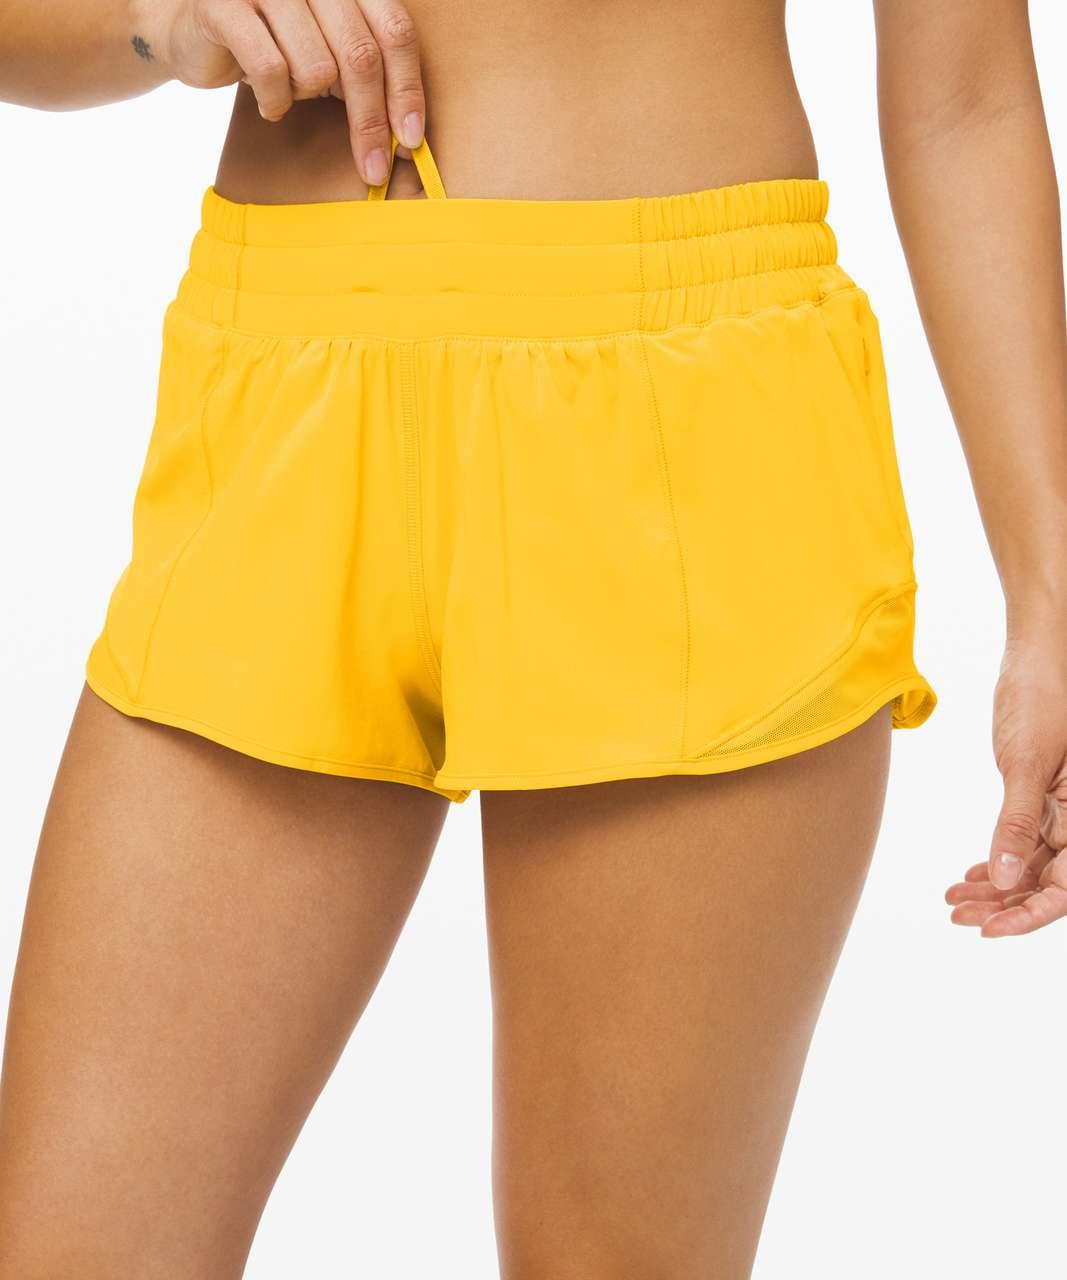 "Lululemon Hotty Hot Short II *2.5"" - Honeycomb"